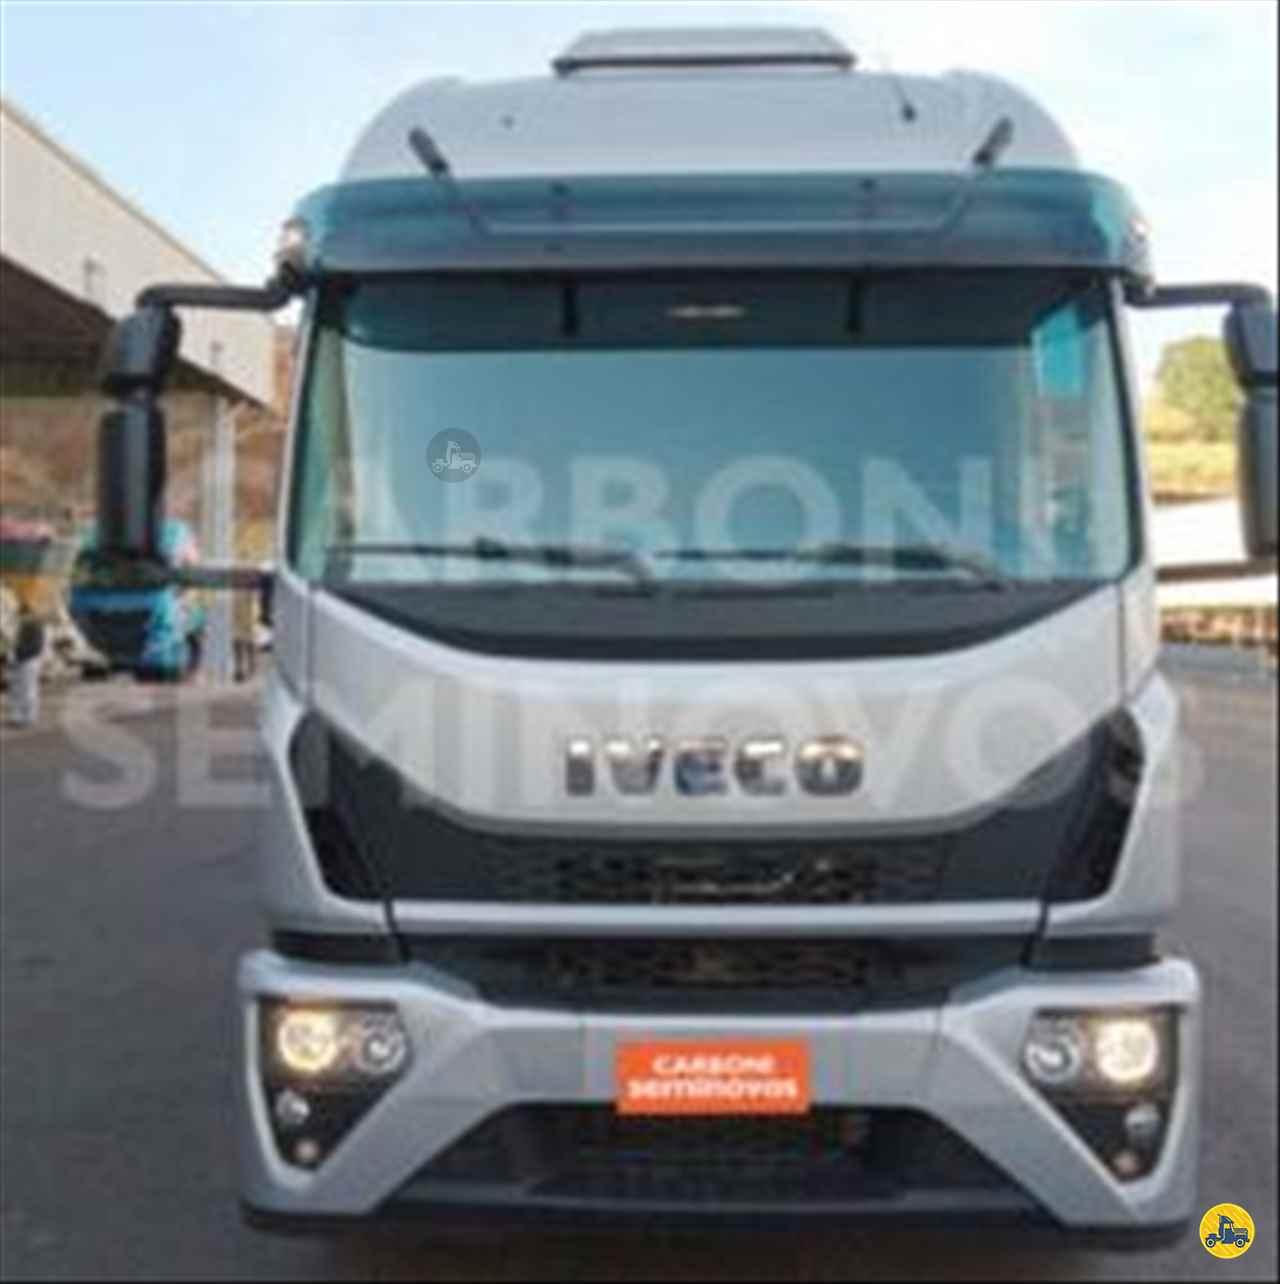 CAMINHAO IVECO TECTOR 240E30 Carga Seca Truck 6x2 Carboni Iveco VIDEIRA SANTA CATARINA SC